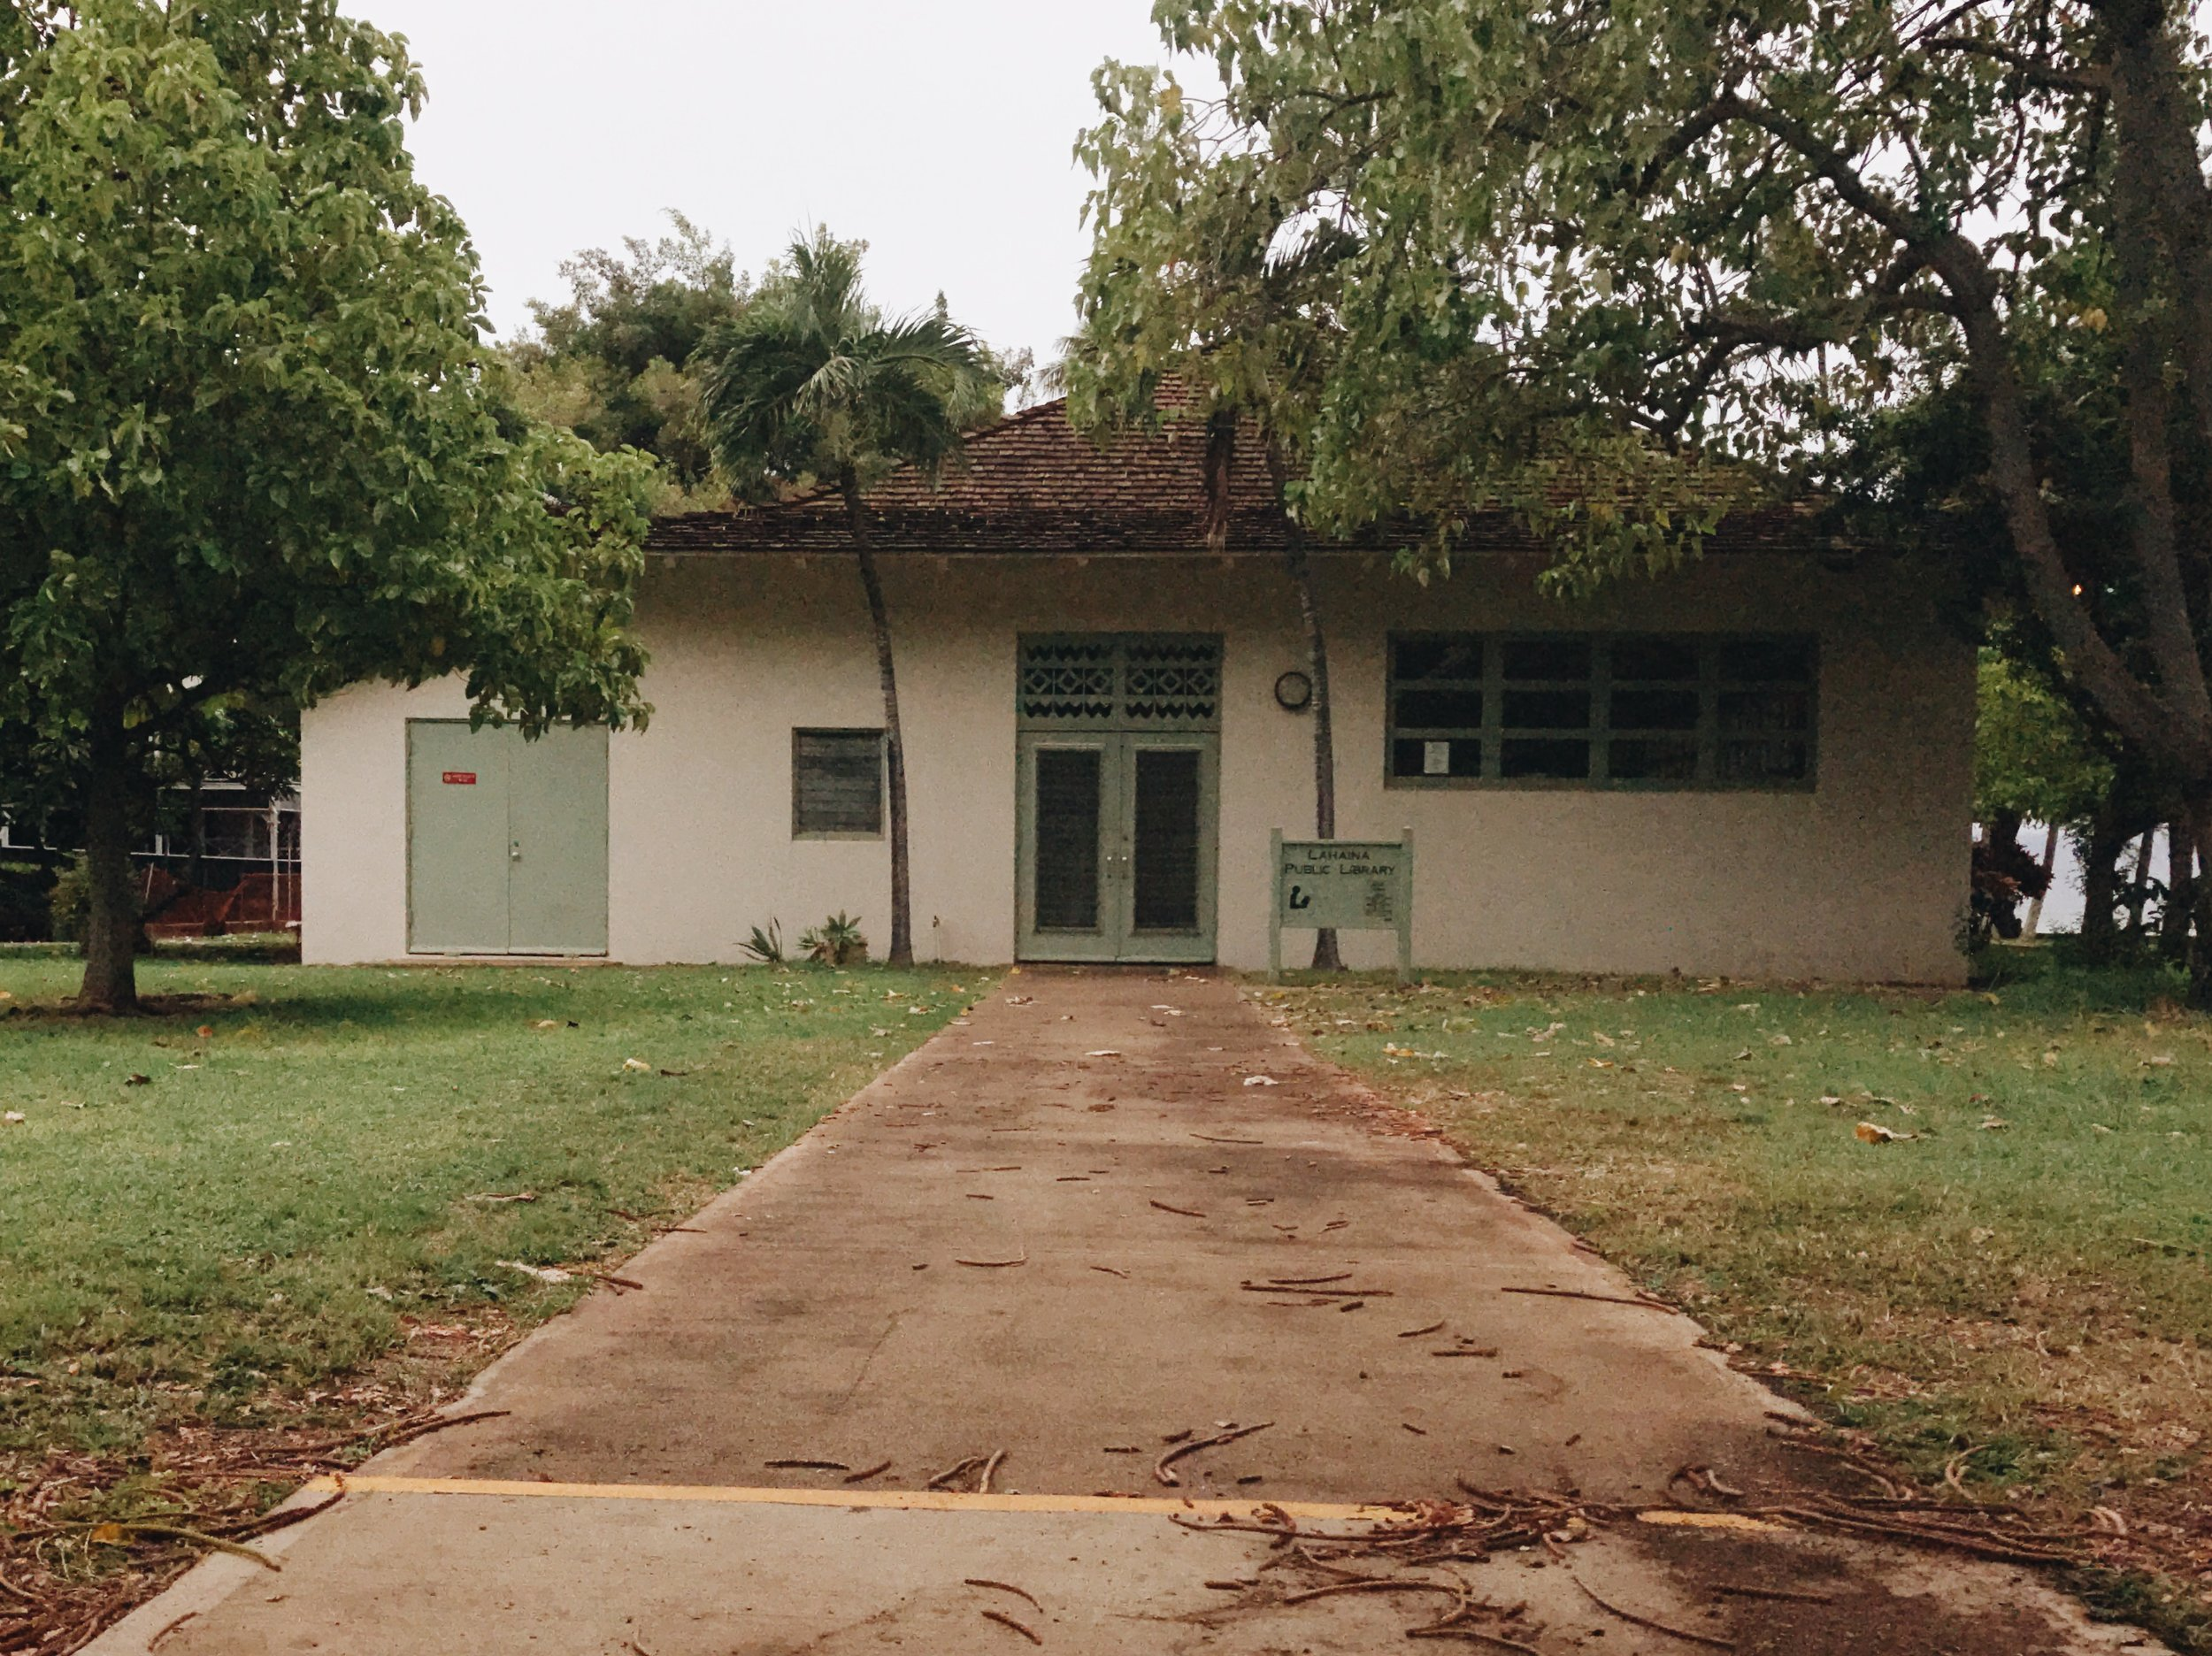 Hawaii-trip-Lahaina-public-library-by-Atlanta-photographer-Chanel-French-21